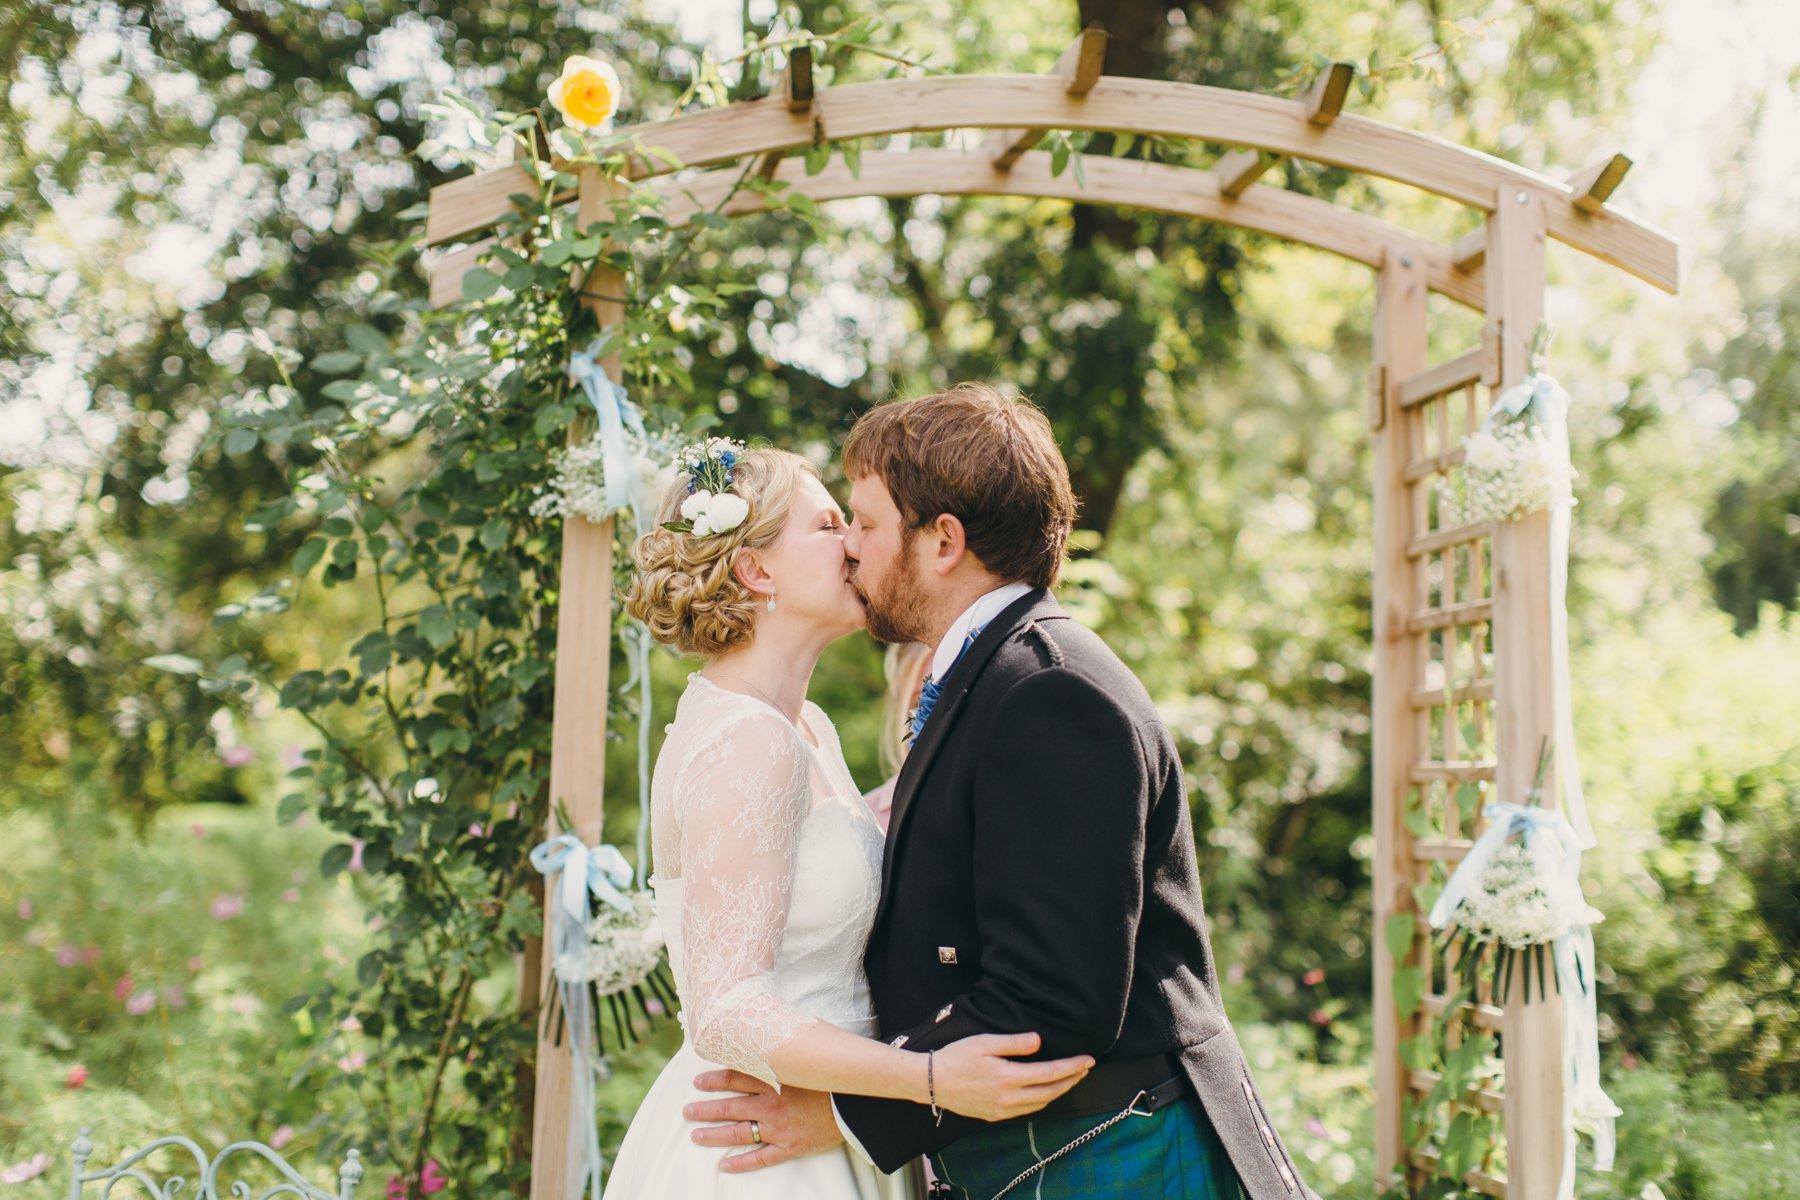 petitmoulin_france_bordeaux_weddings_0047